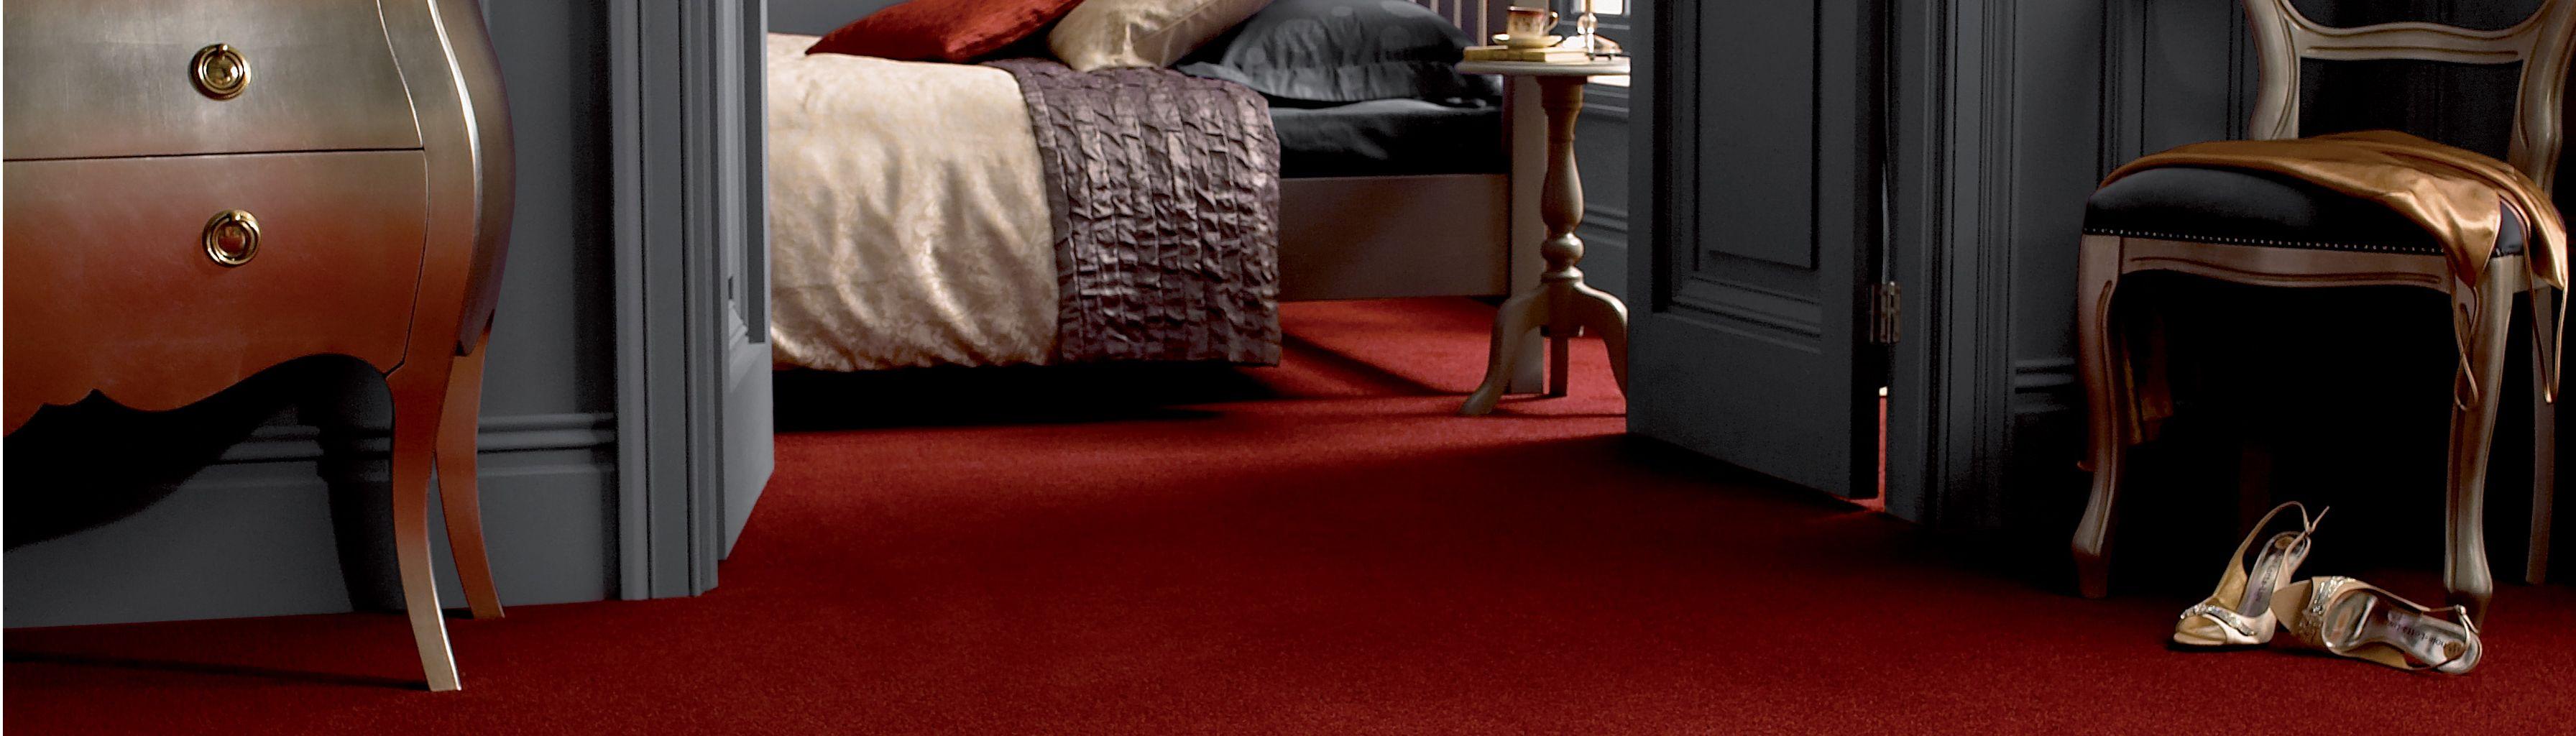 image of carpets